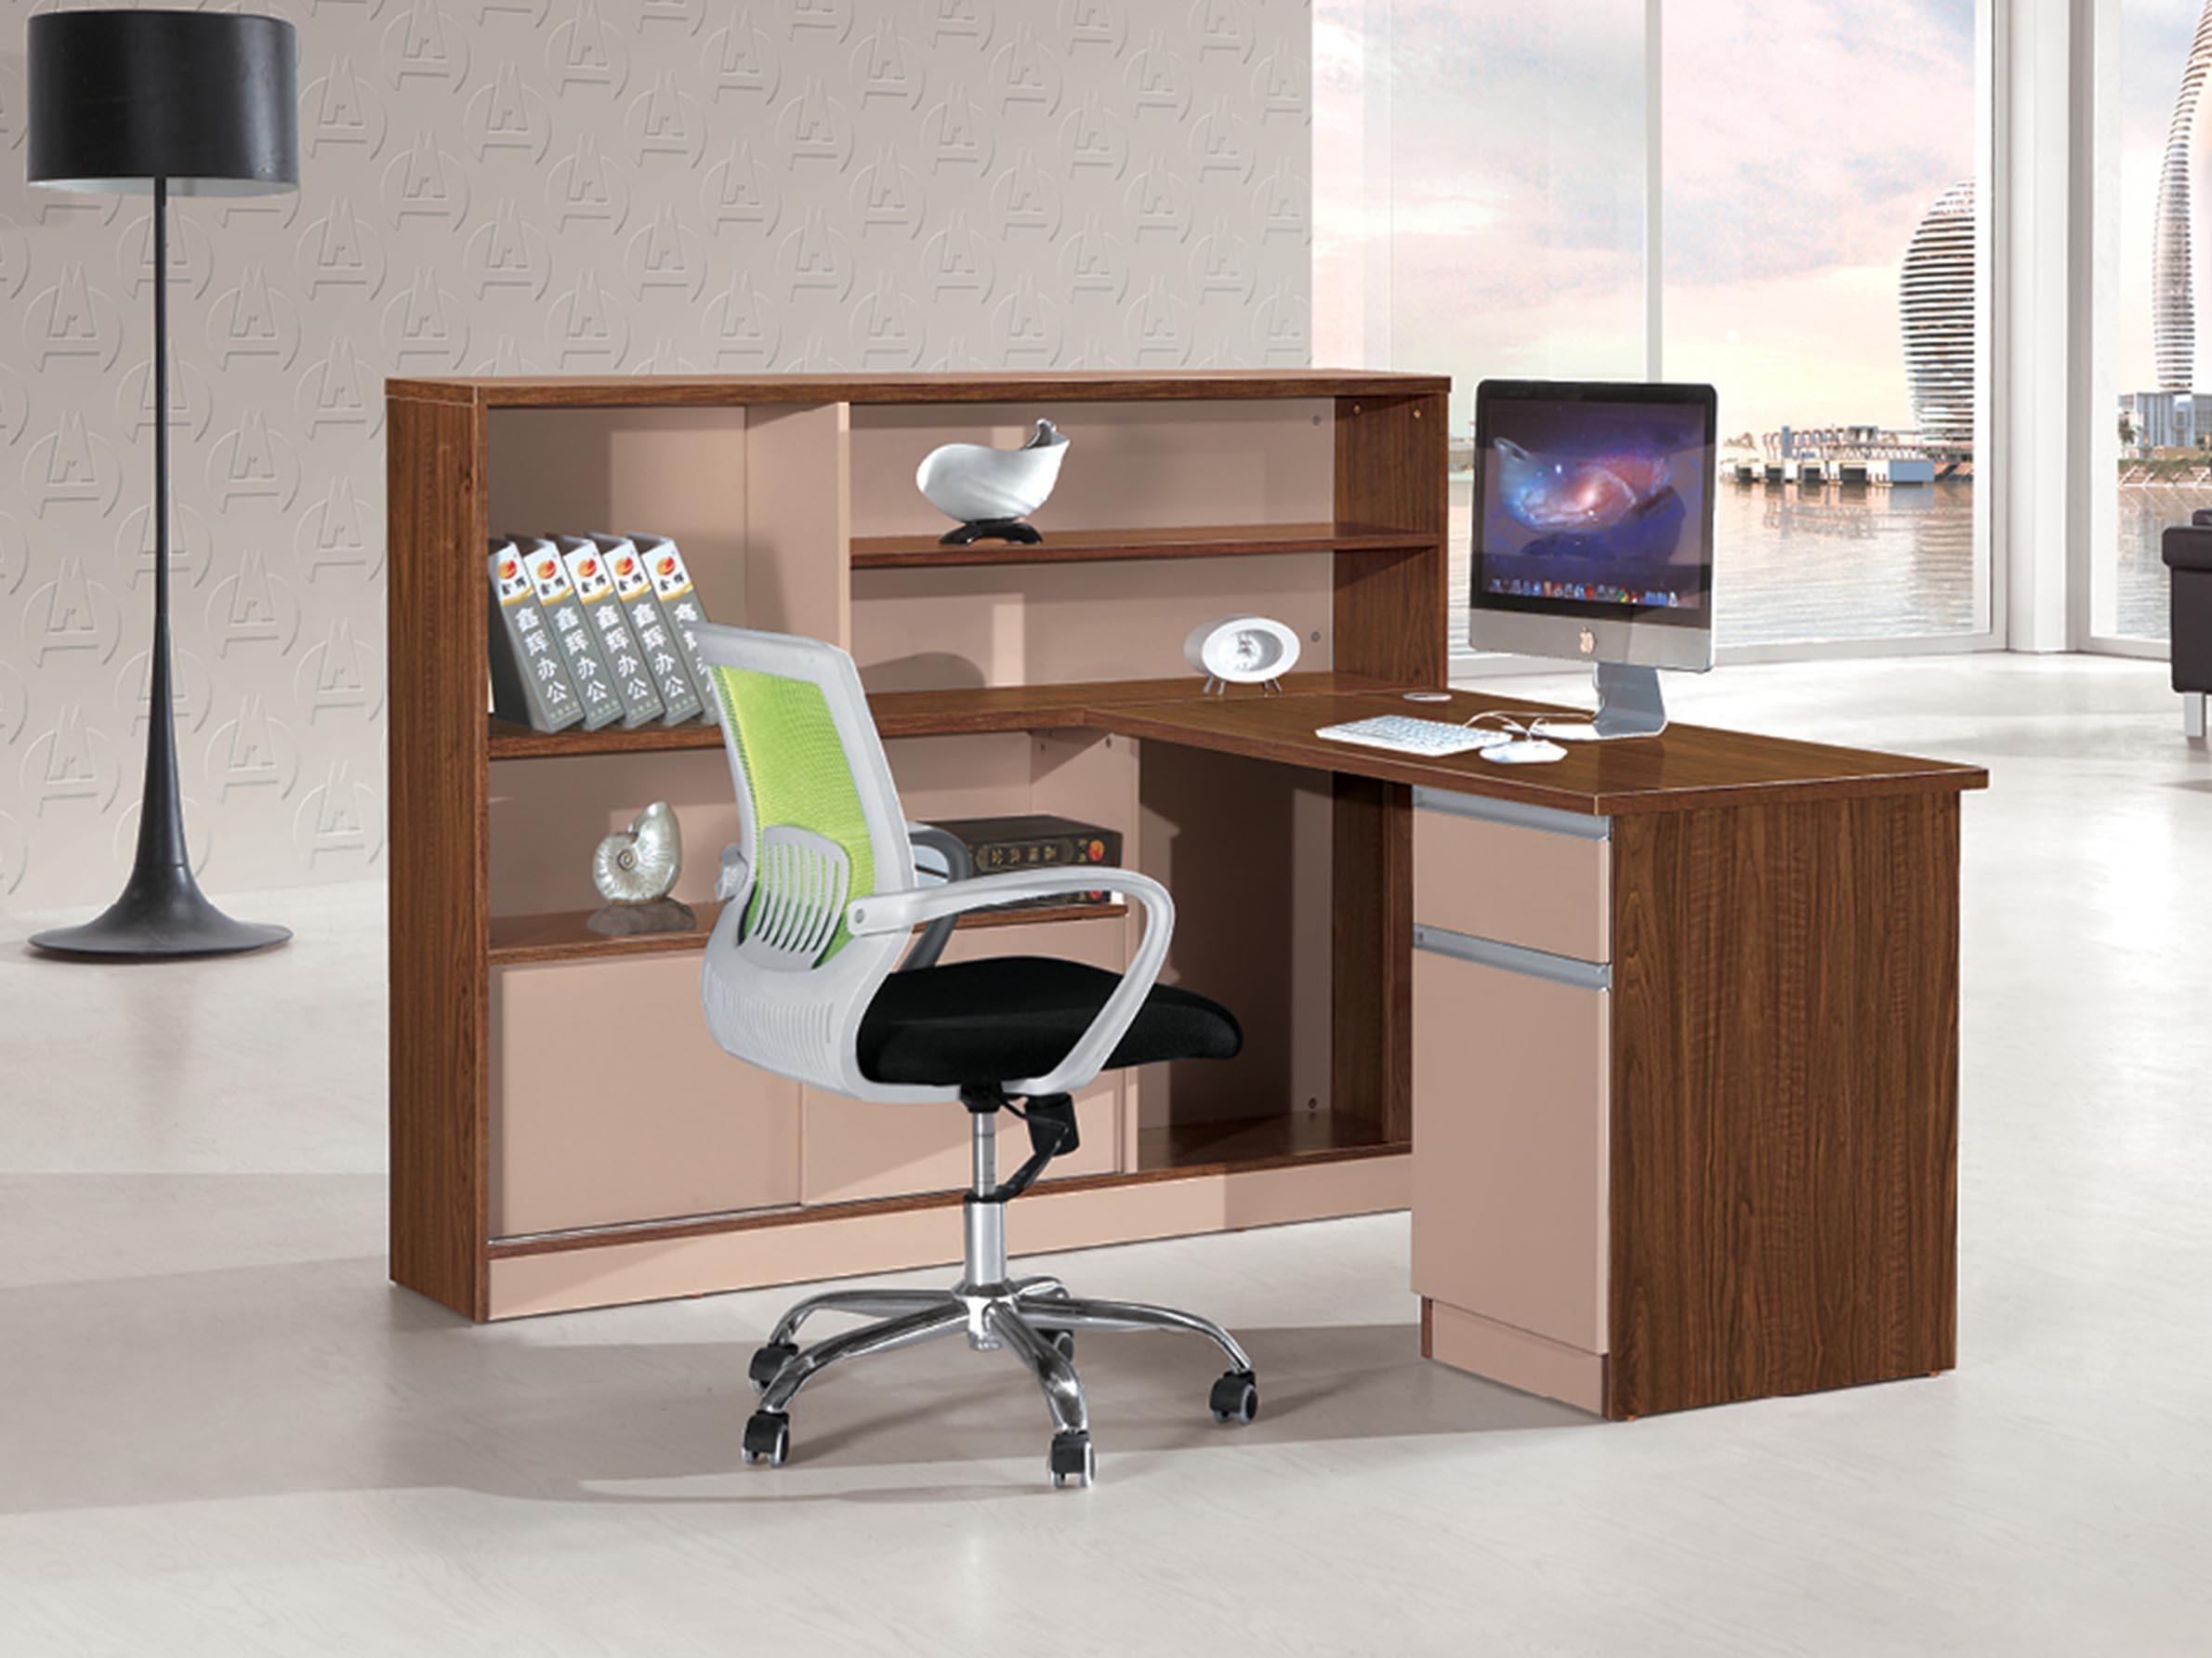 Modern Wood Furniture Office Computer Desk with Bookshelf